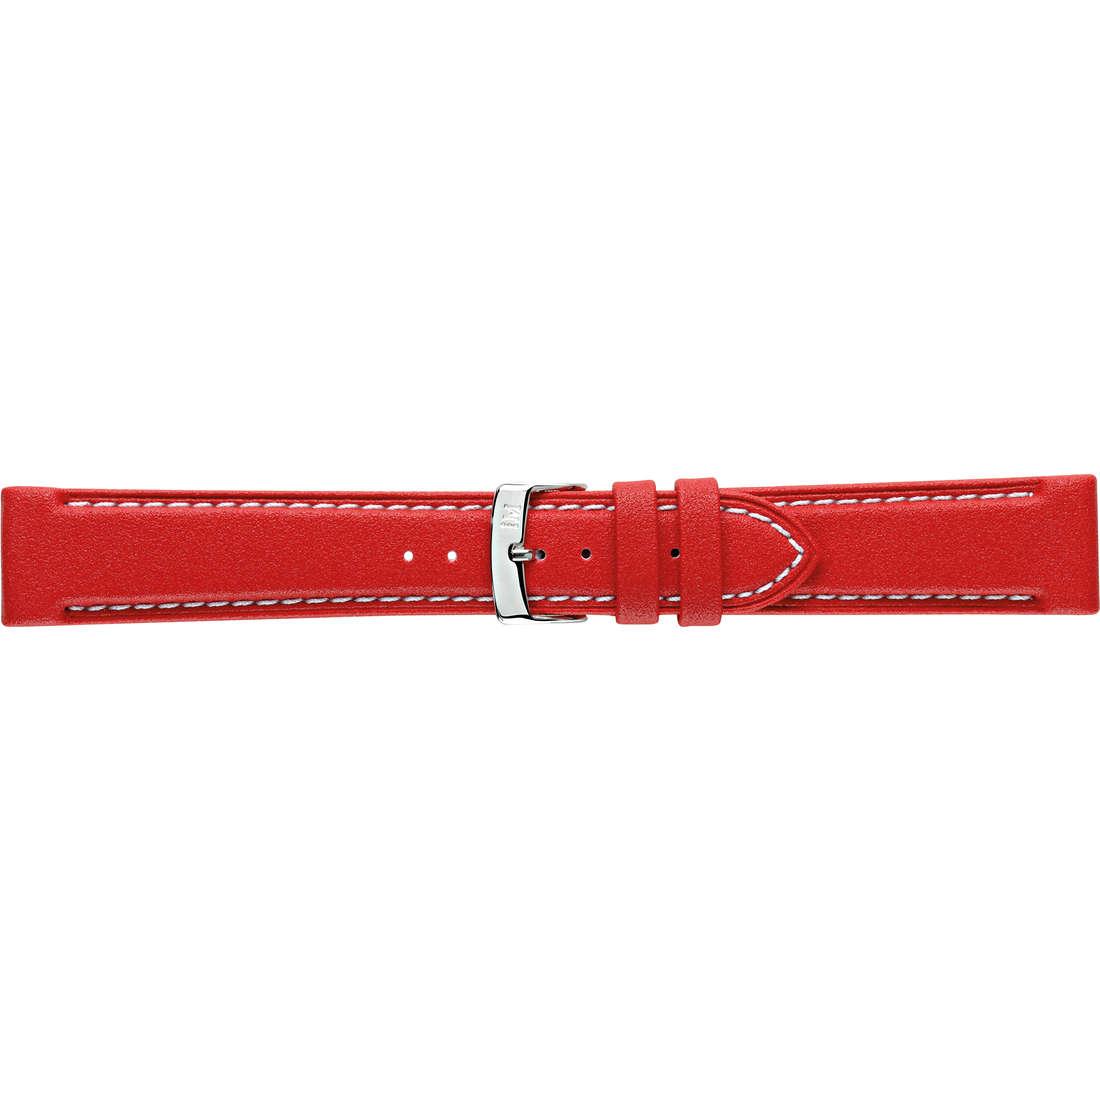 watch watch bands watch straps man Morellato Linea Sport A01U3822A42083CR22